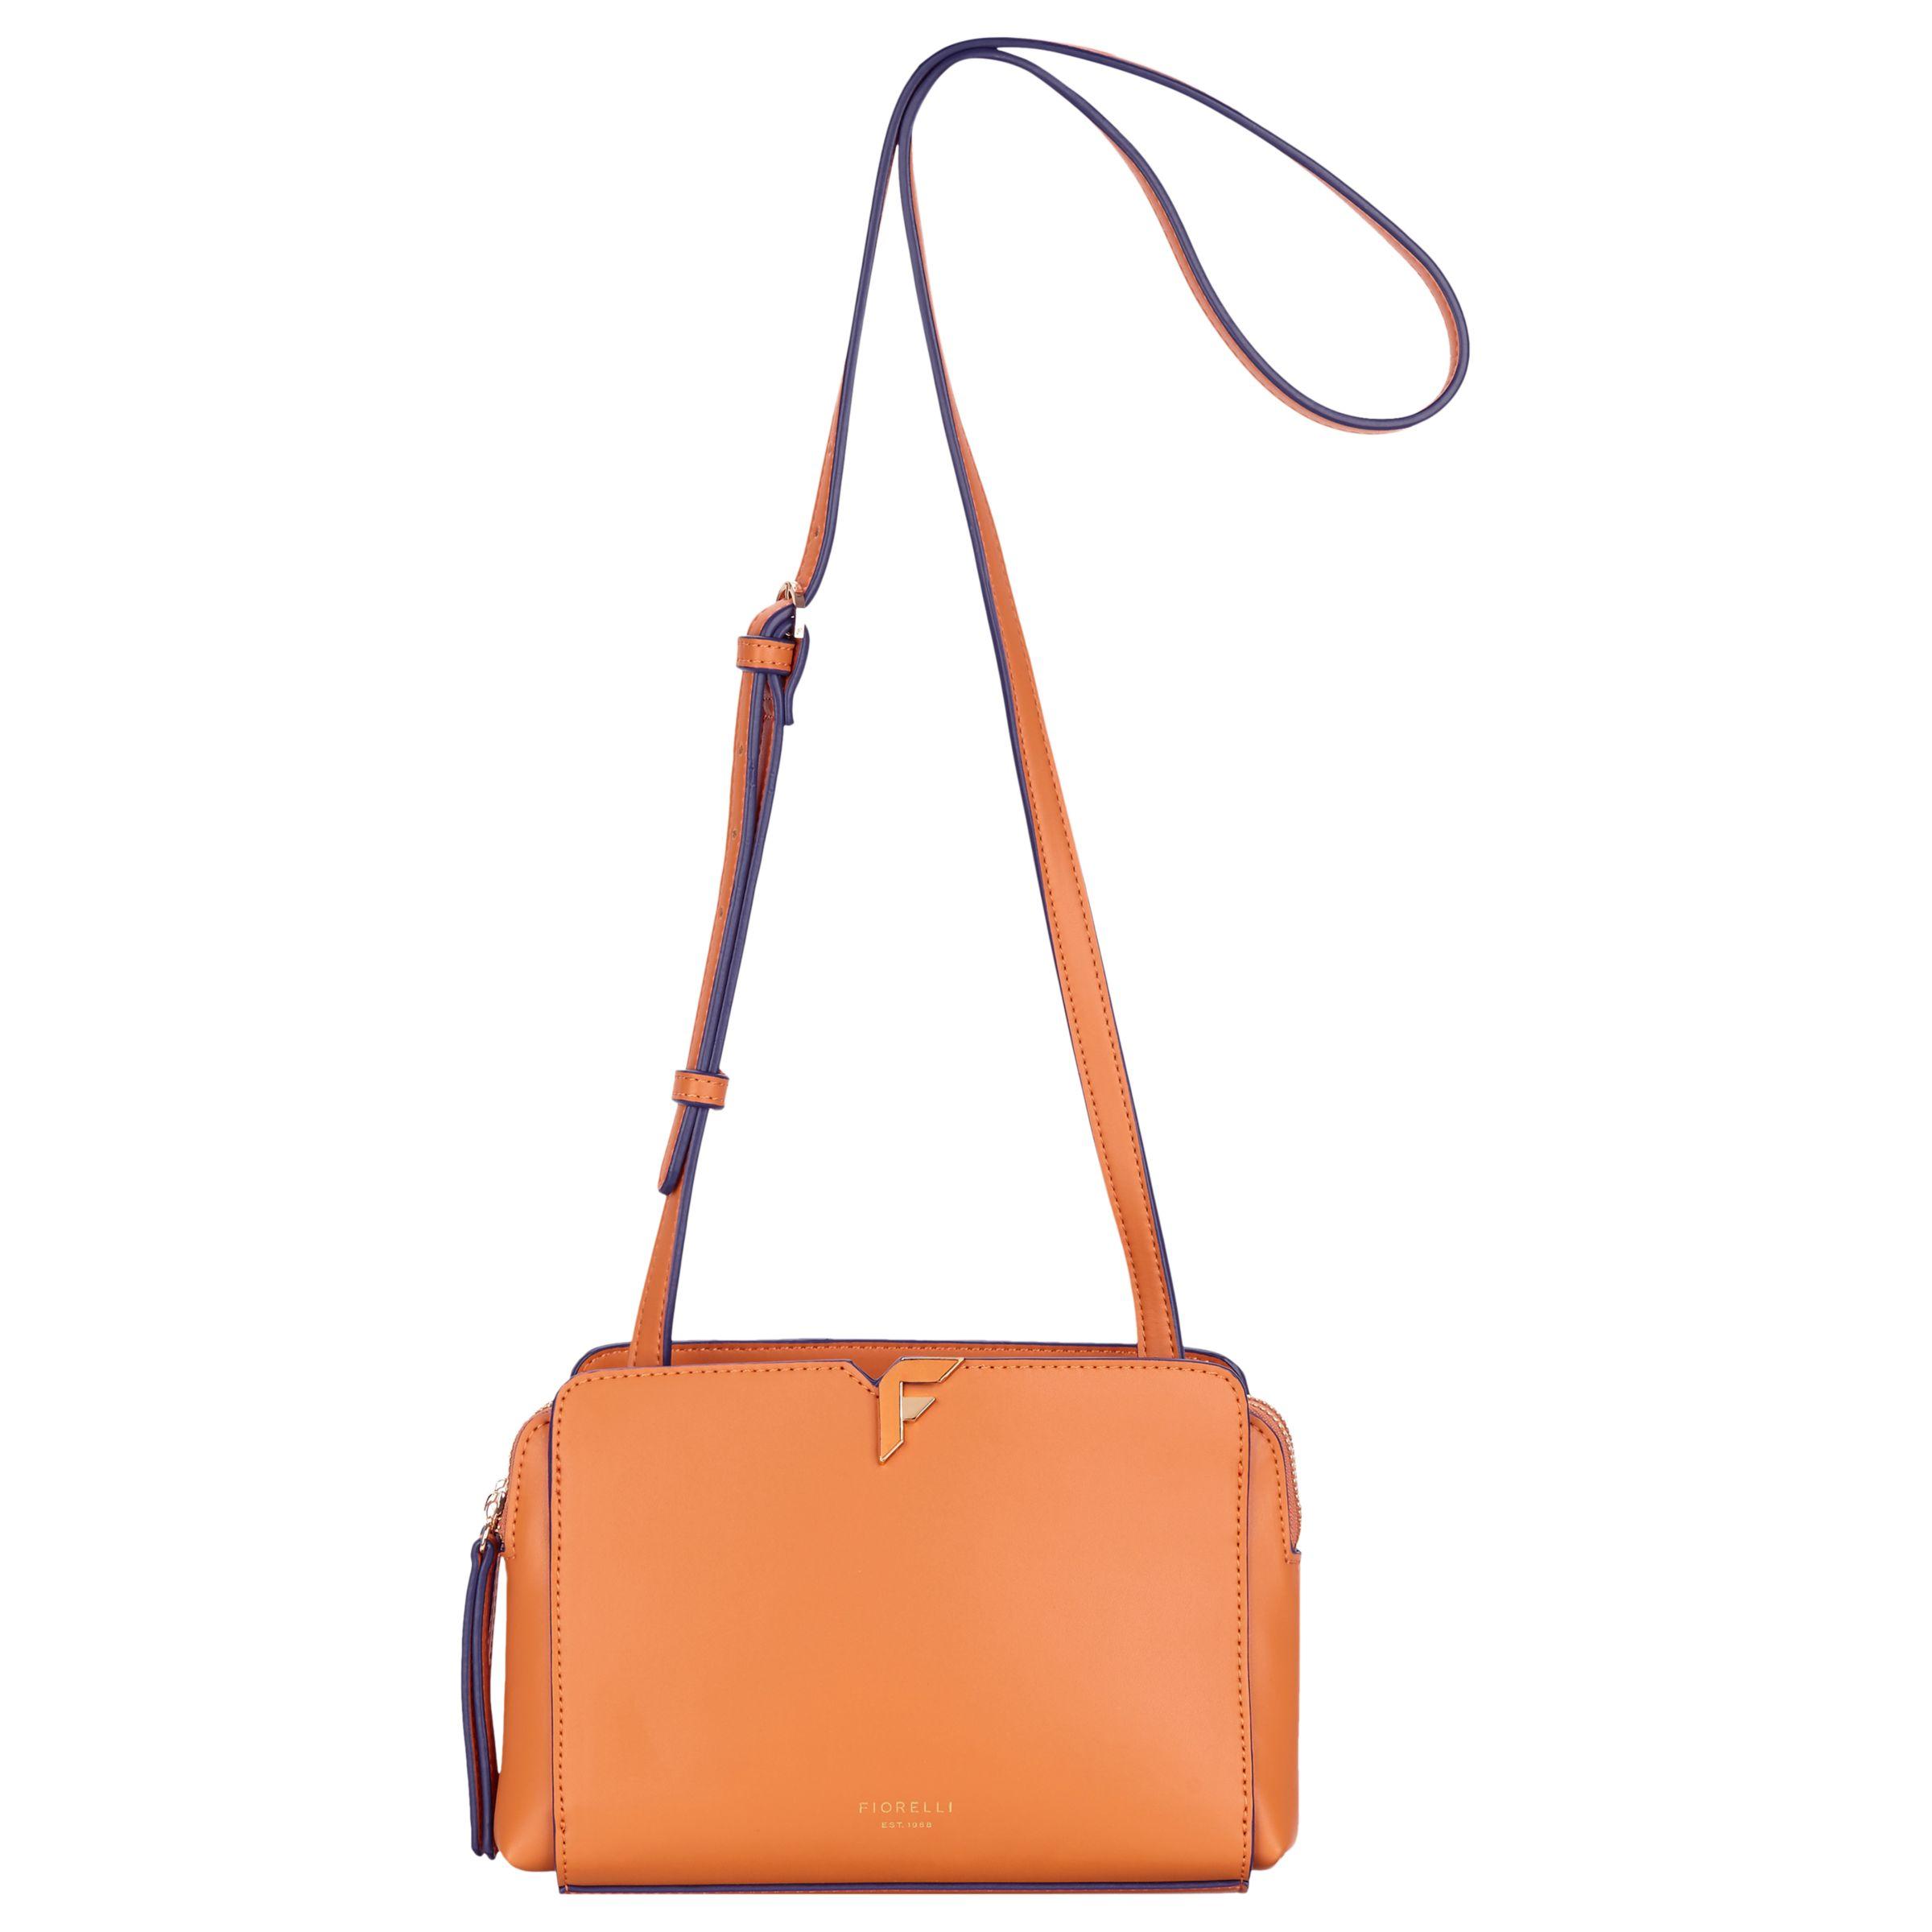 Fiorelli Fiorelli Sadie Across Body Bag